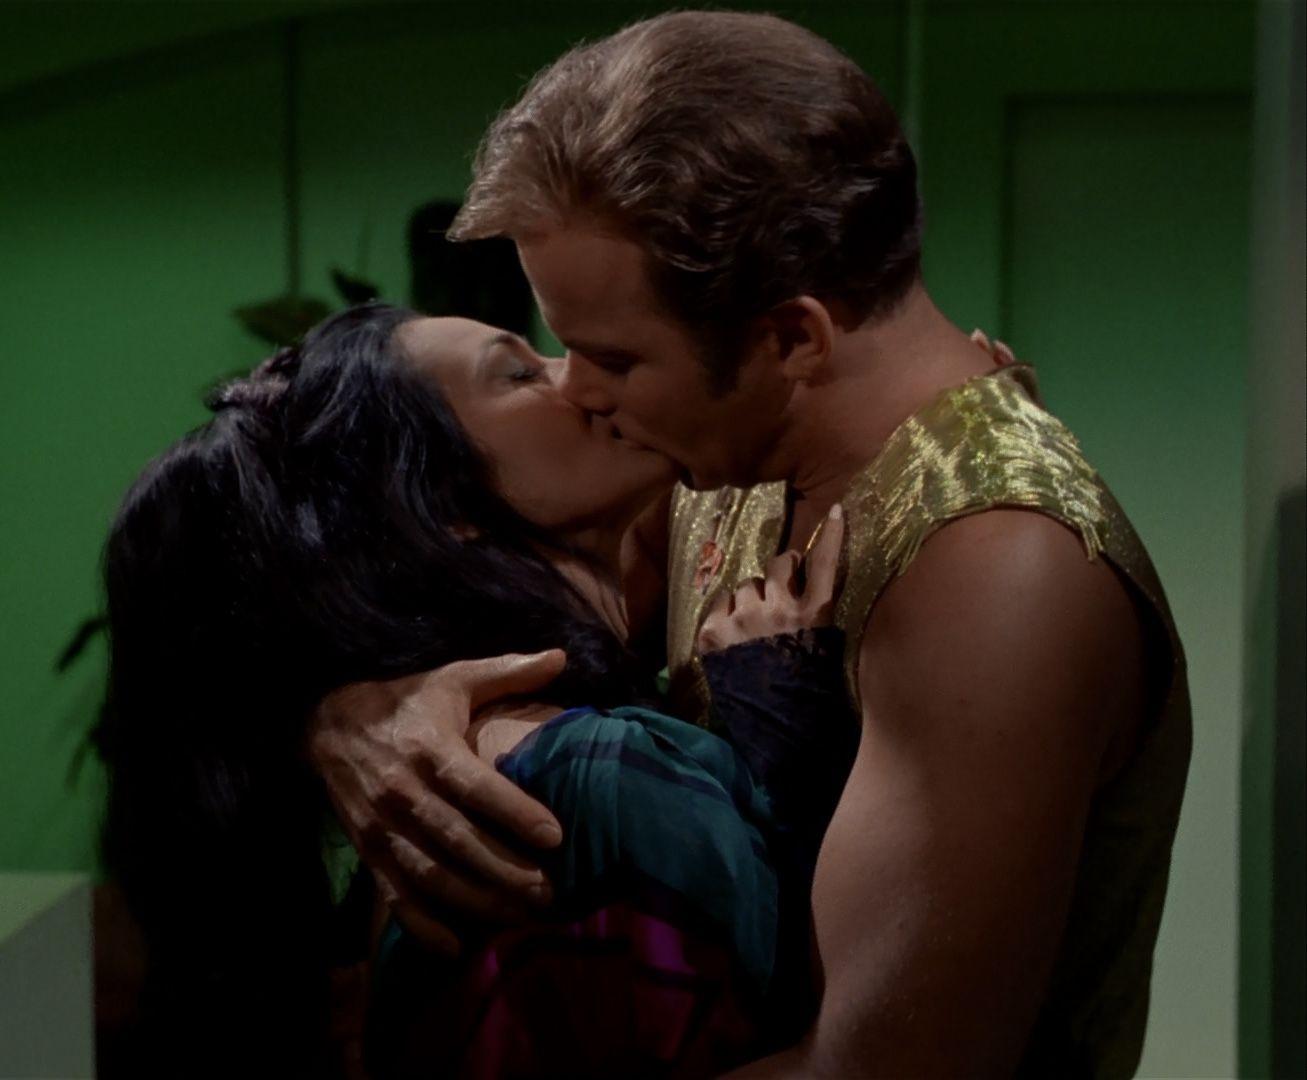 William Shatner and Barbara Luna kiss in the Star Trek episode Mirror, Mirror